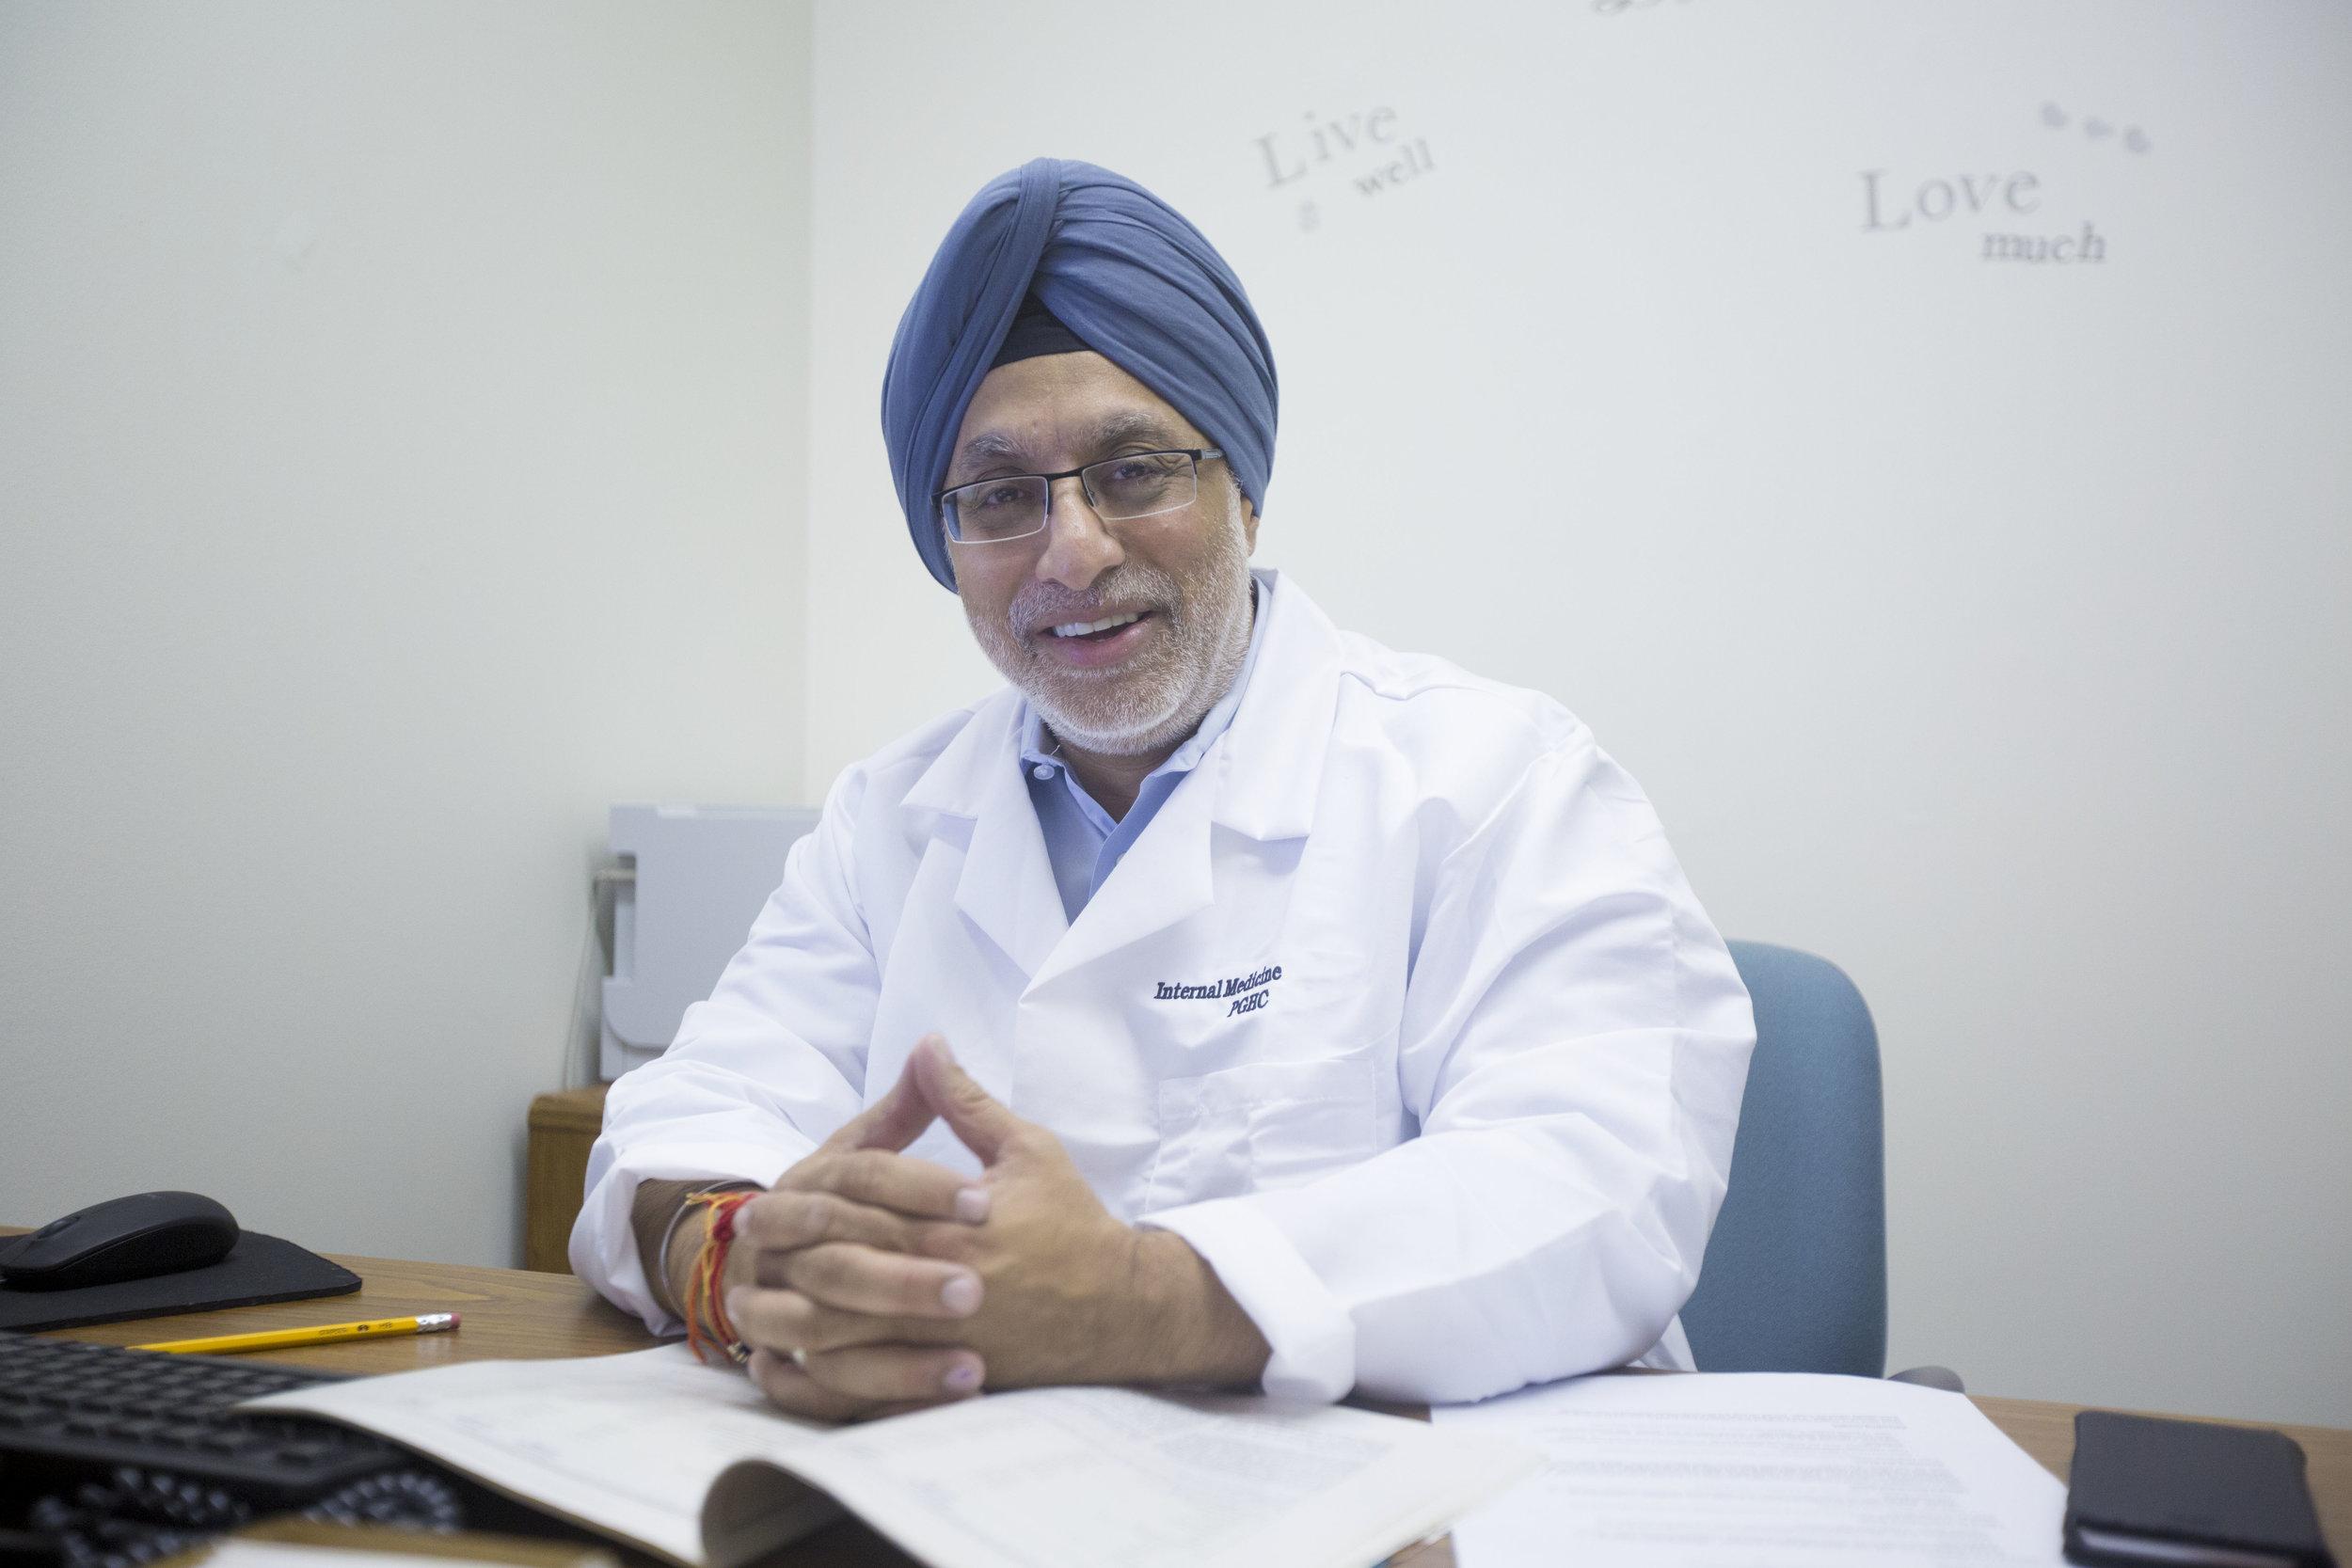 Gurdeep Chhabra, MD, Chair, Dept. of Medicine